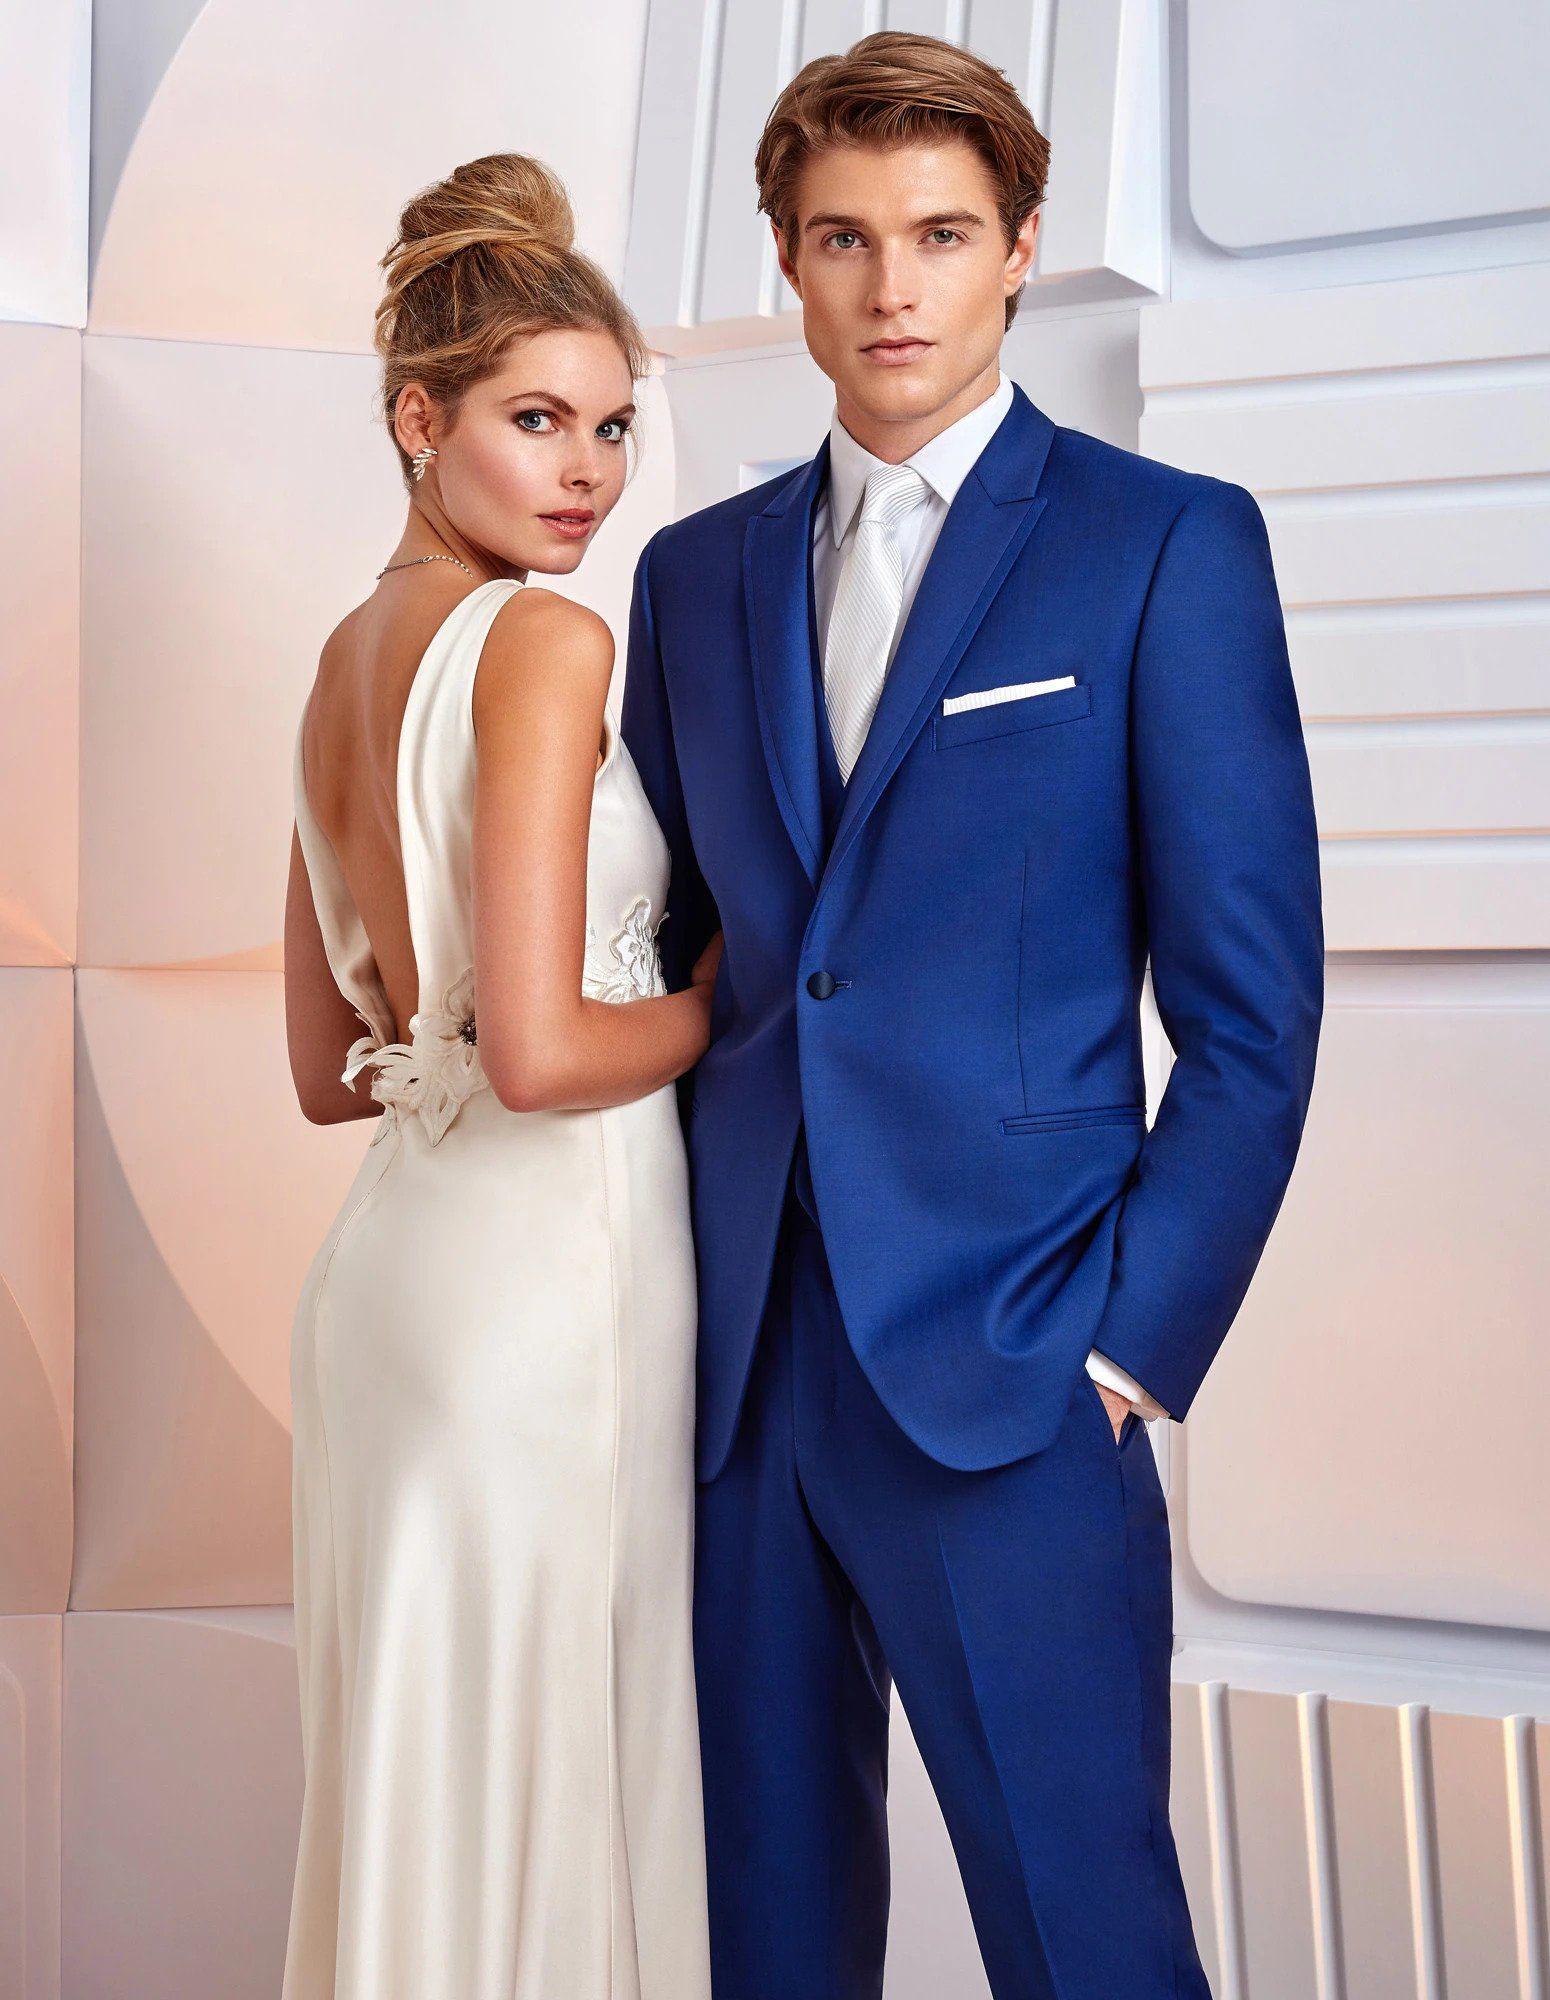 Greenwich Tuxedo Cobalt Blue in 2020 Blue tuxedos, Prom